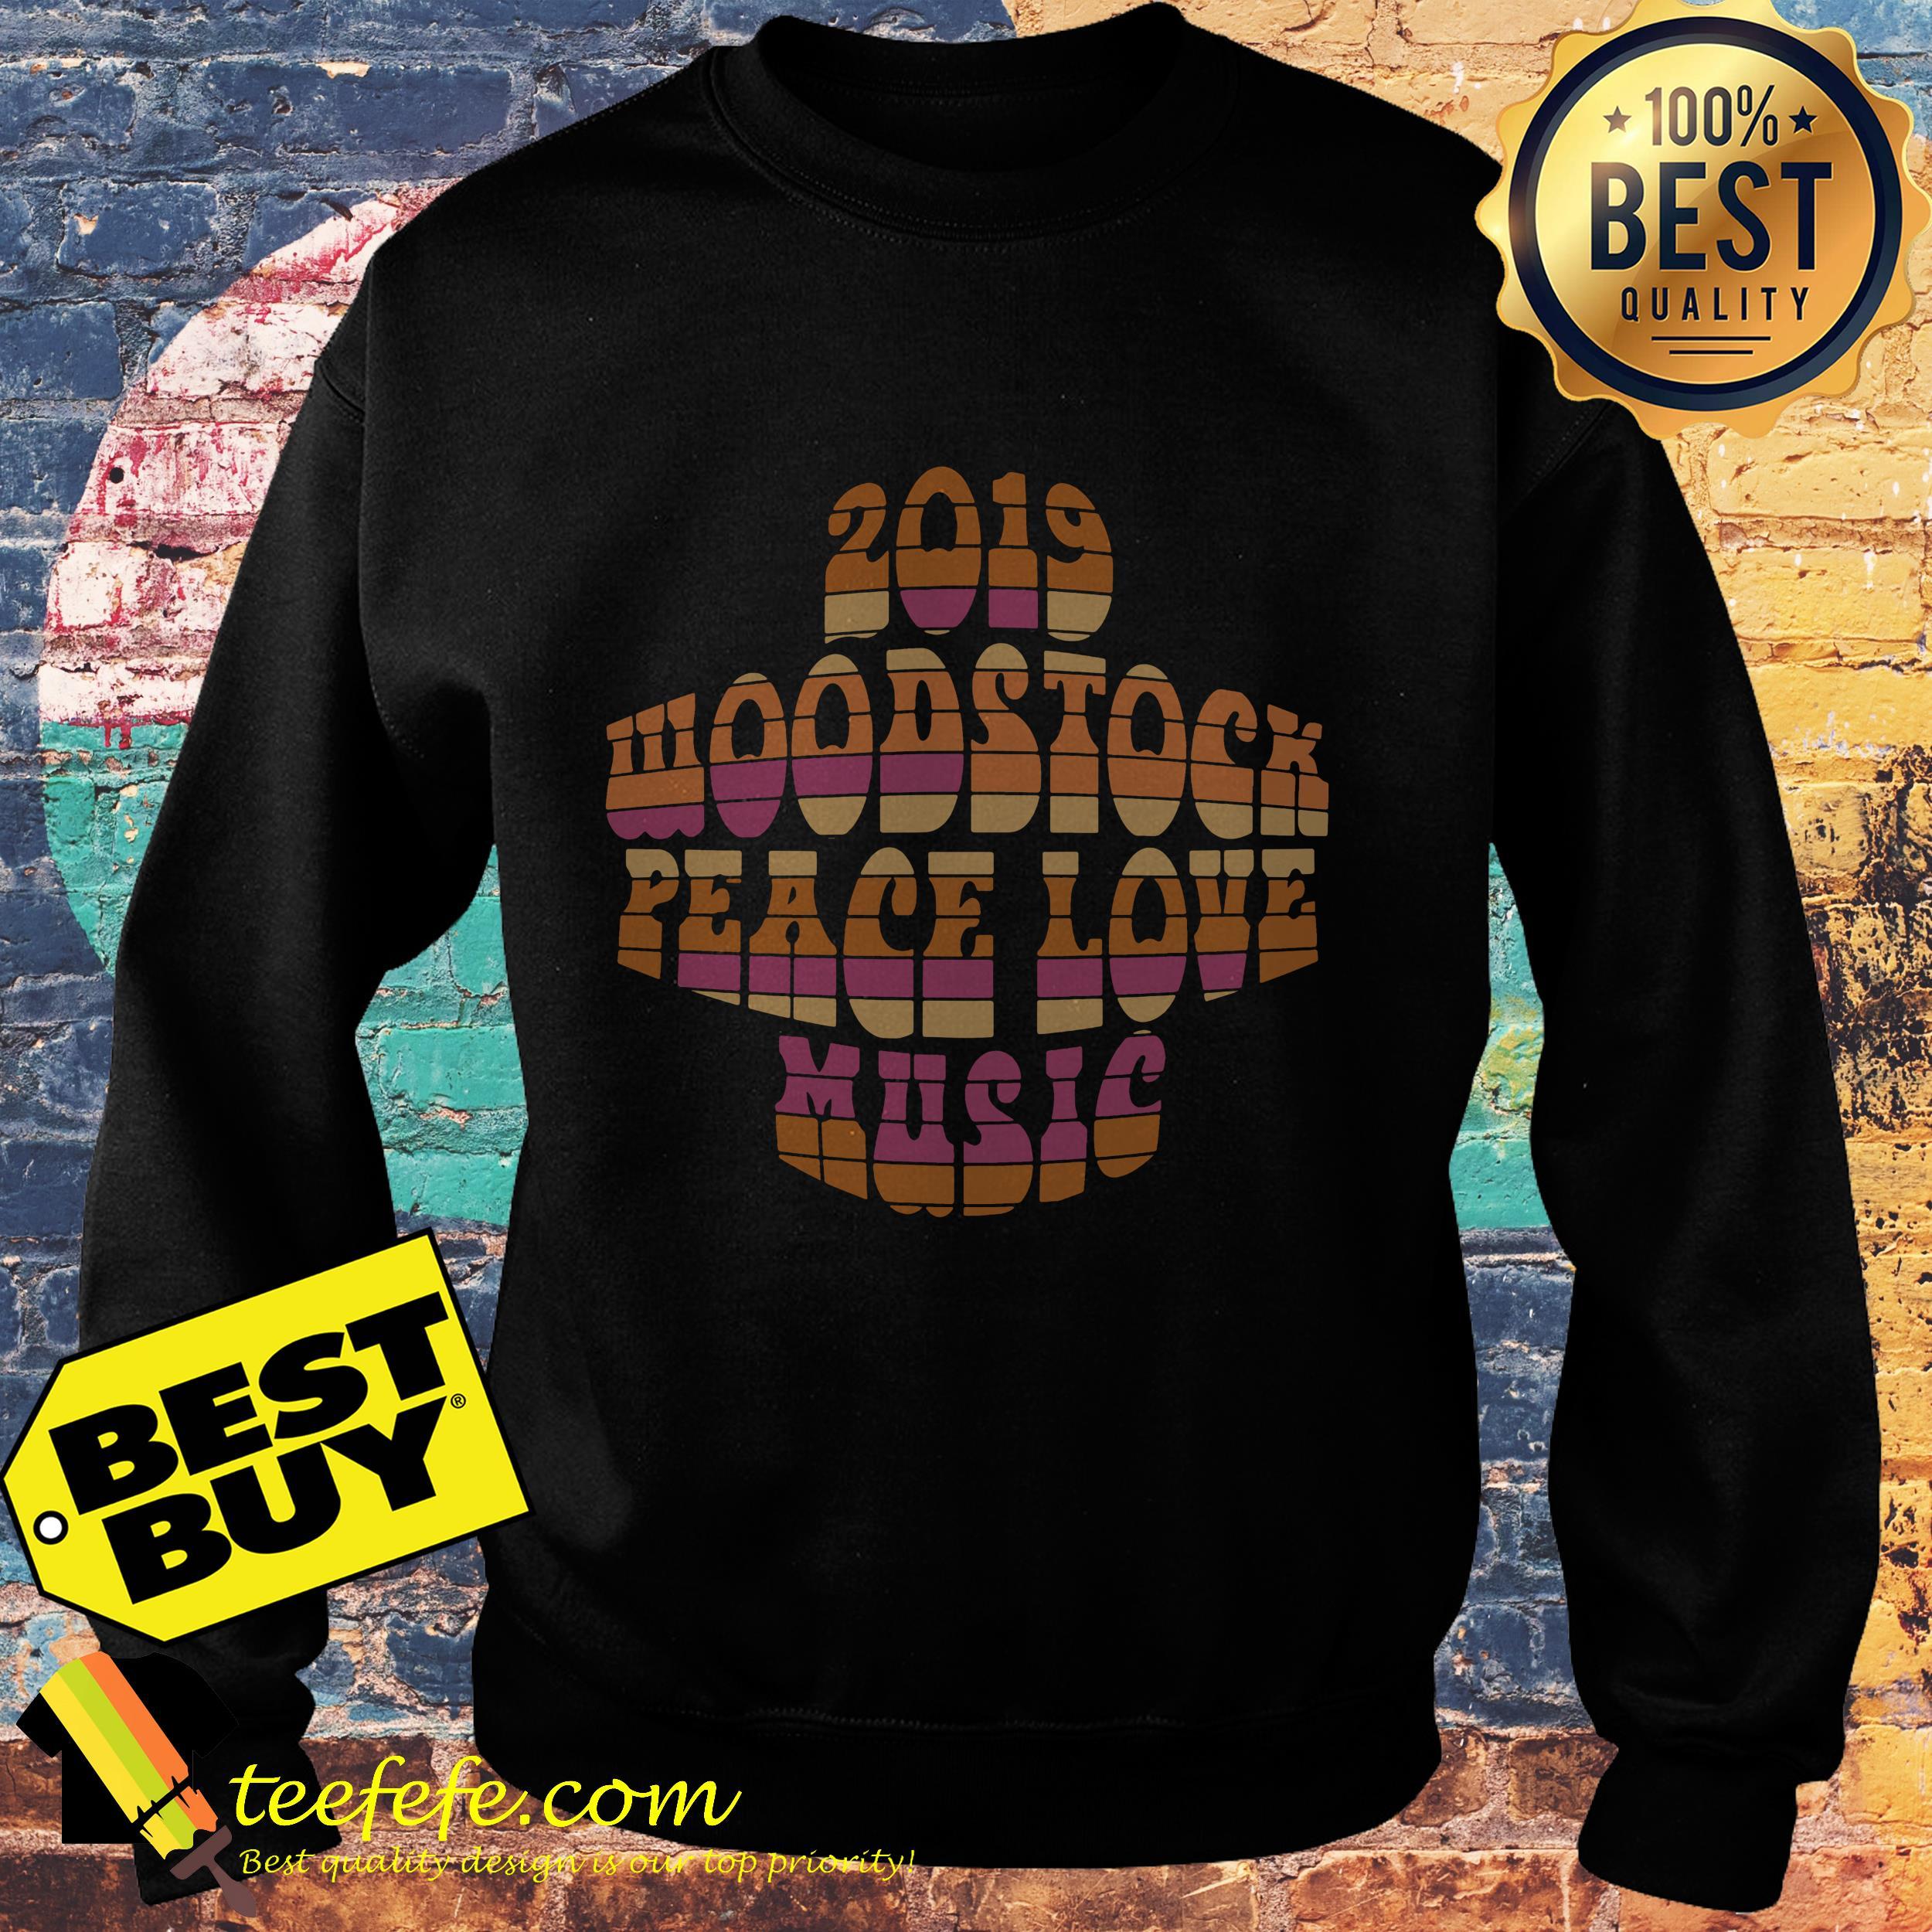 2019 Woodstock peace love music sweatshirt